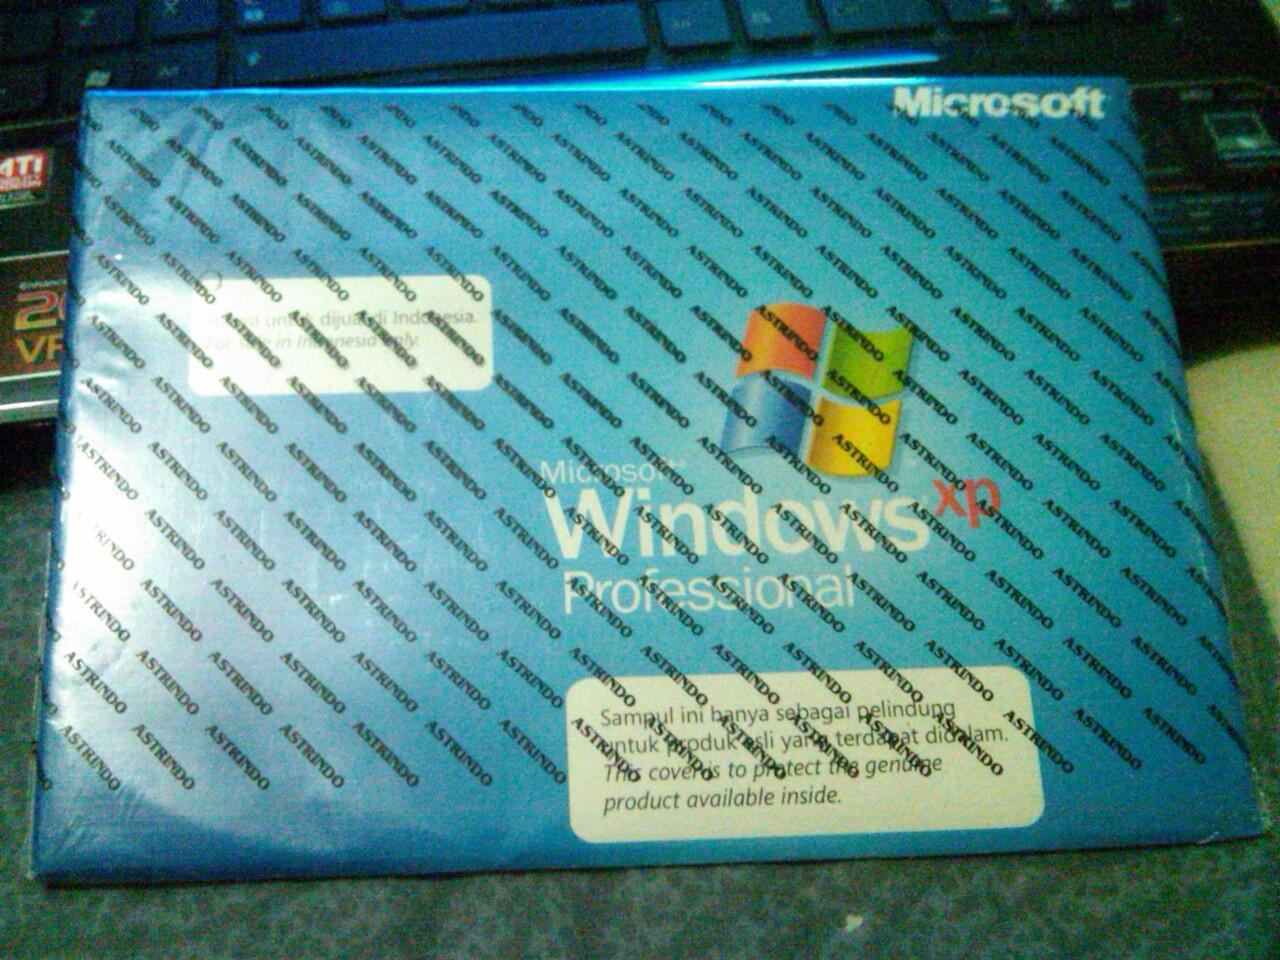 WINDOWS XP PROFESSIONAL ORI,, MASIH SEGEL... 200RBU